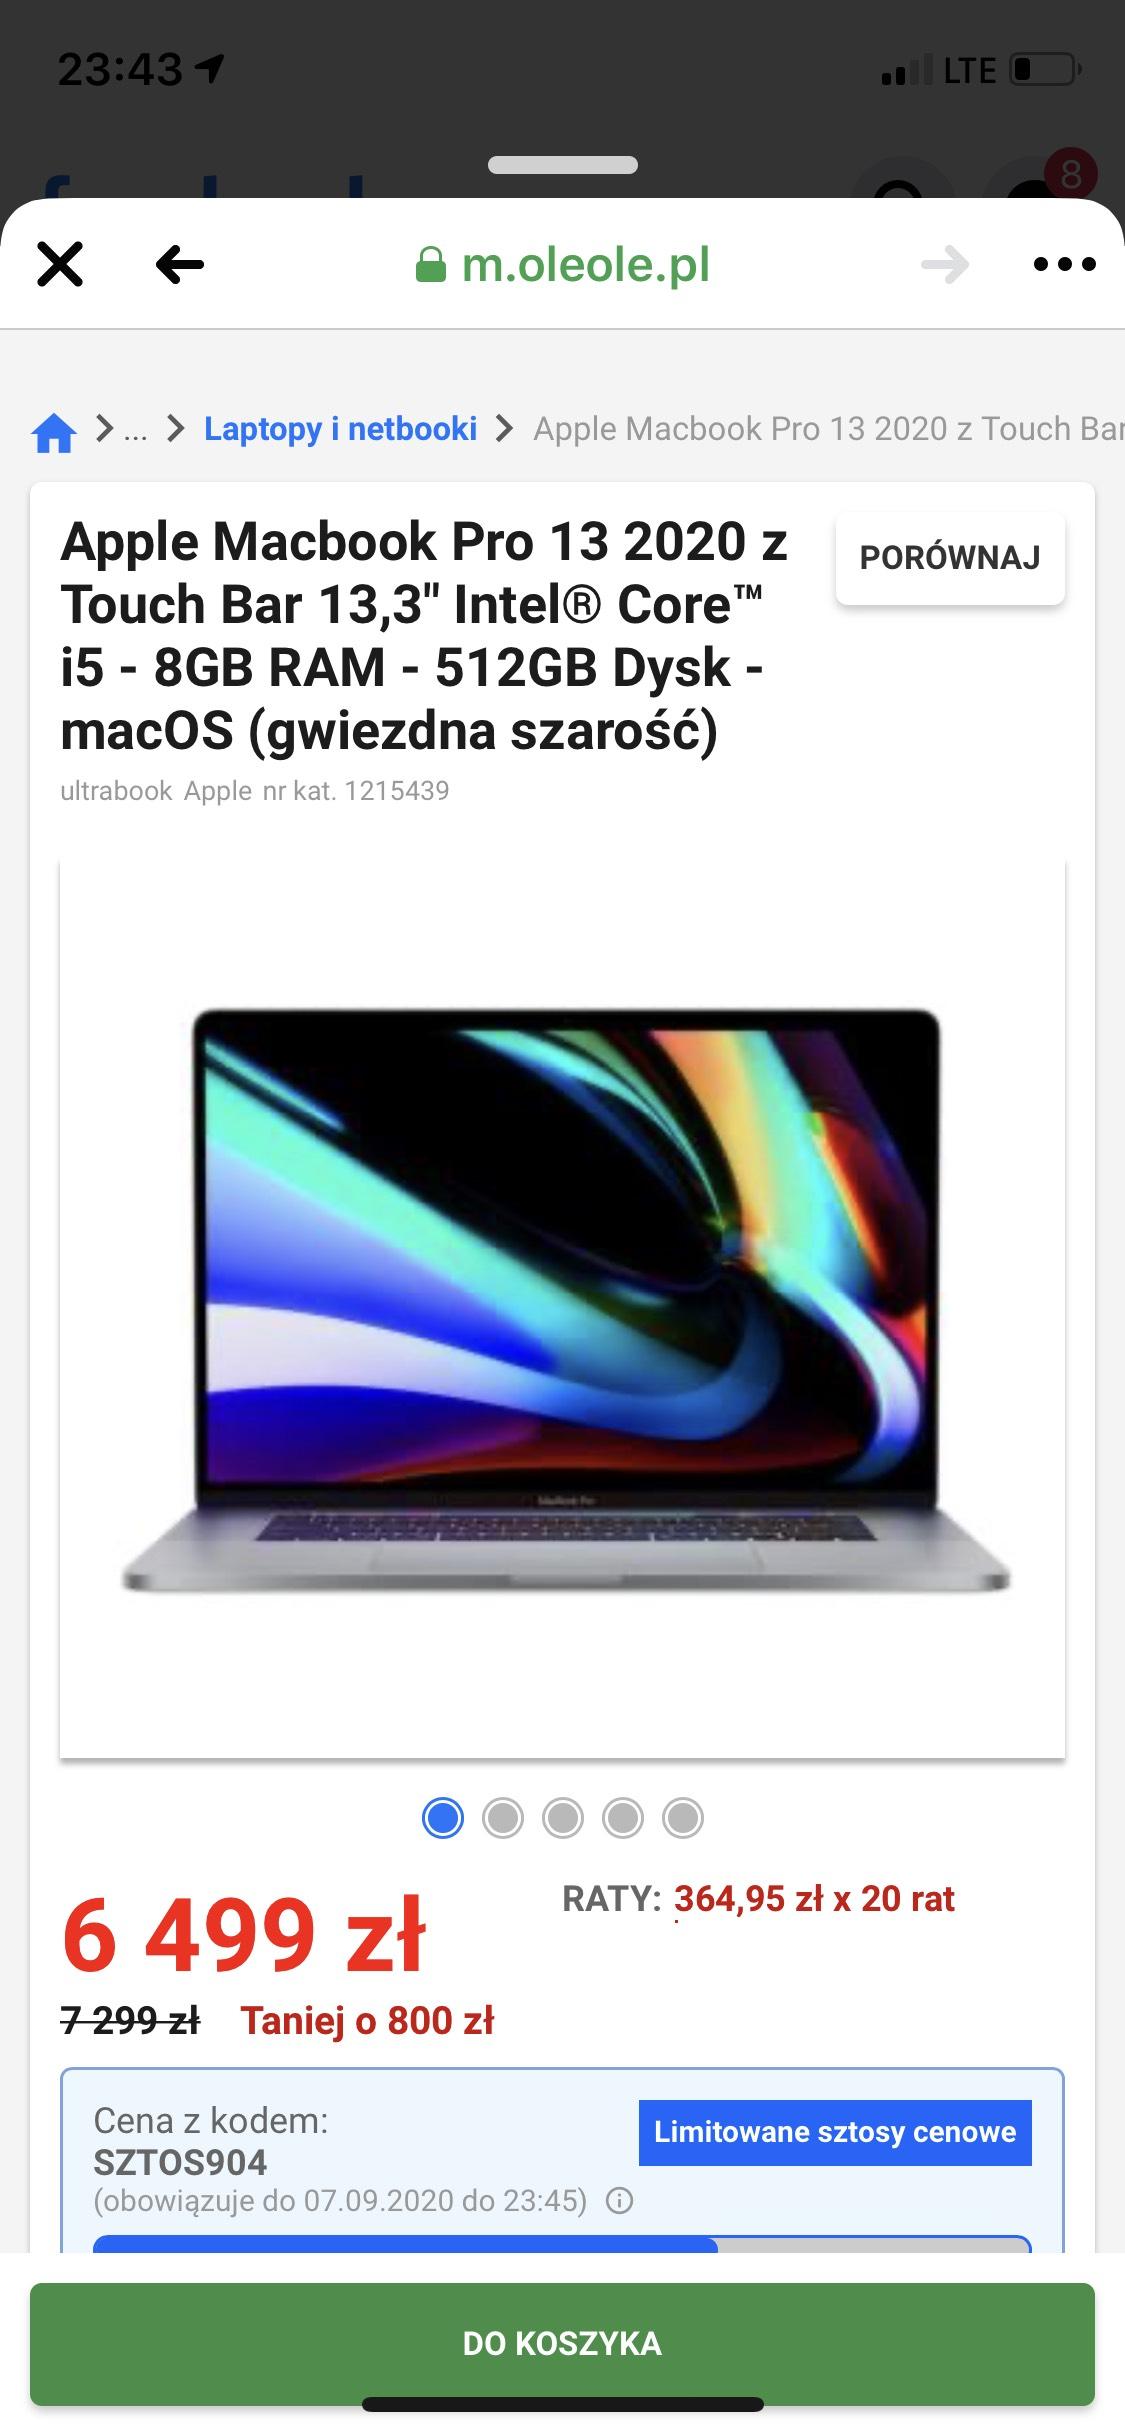 Apple Macbook Pro 13 2020 512GB